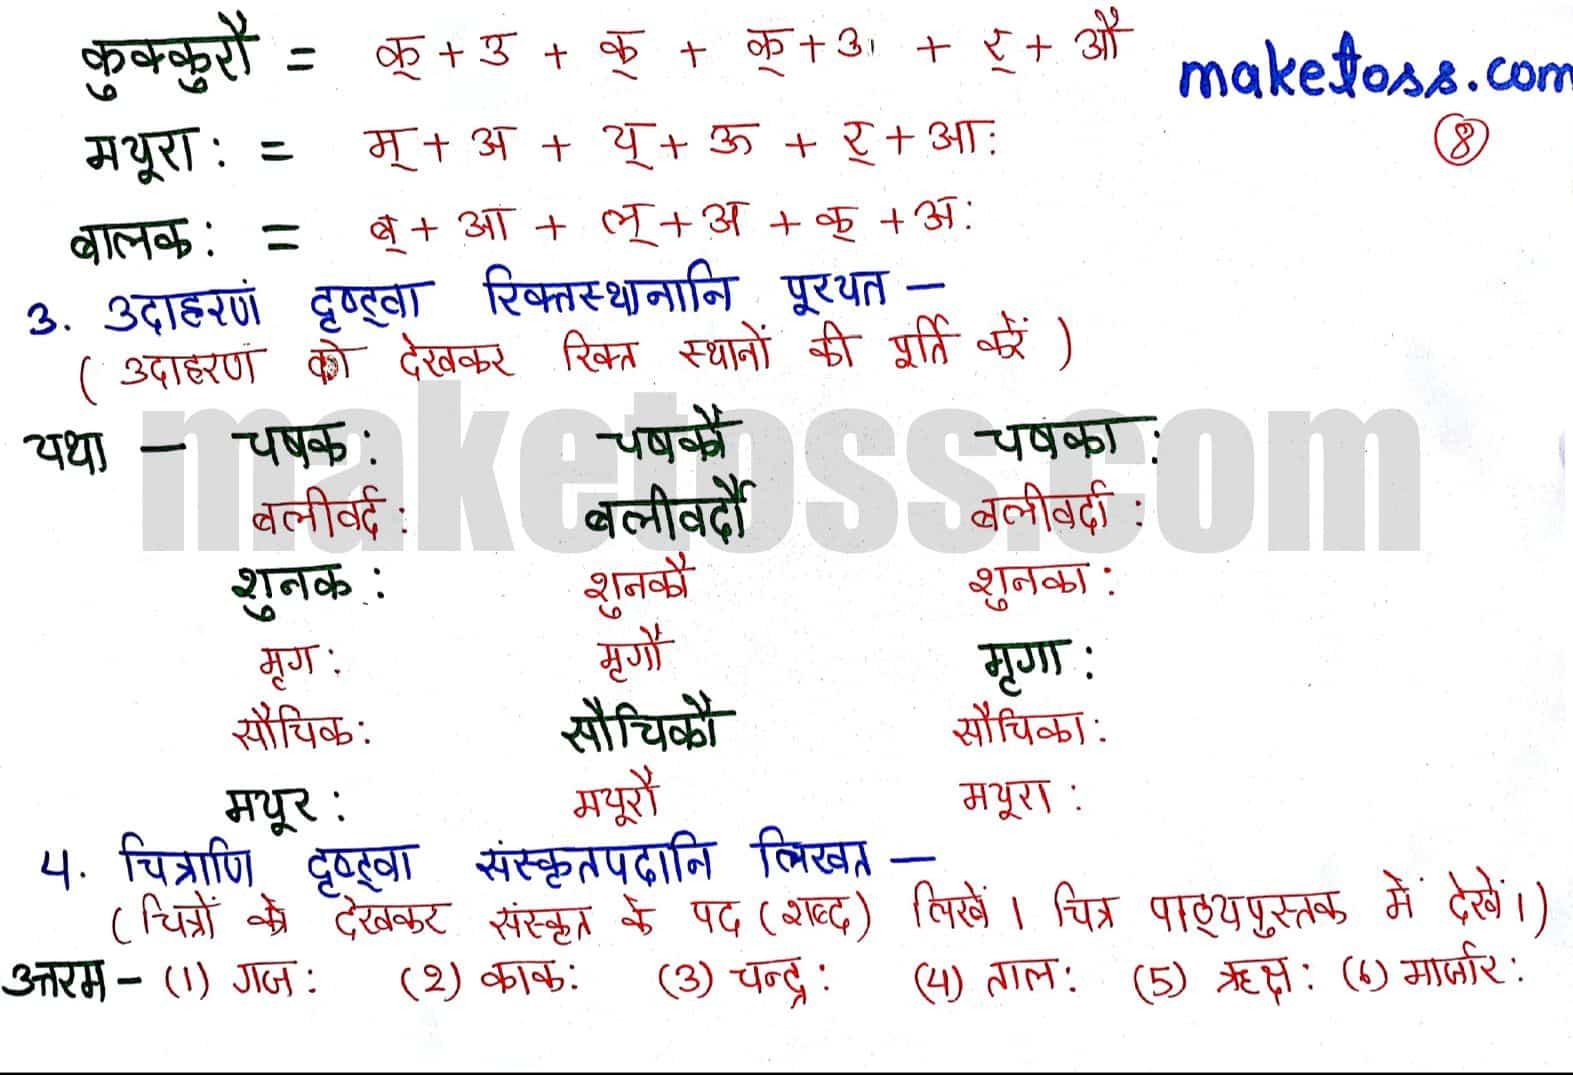 Sanskrit Class 6 chapter 1 - शब्दपरिचय 1 - Ncert solution + translation in Hindi